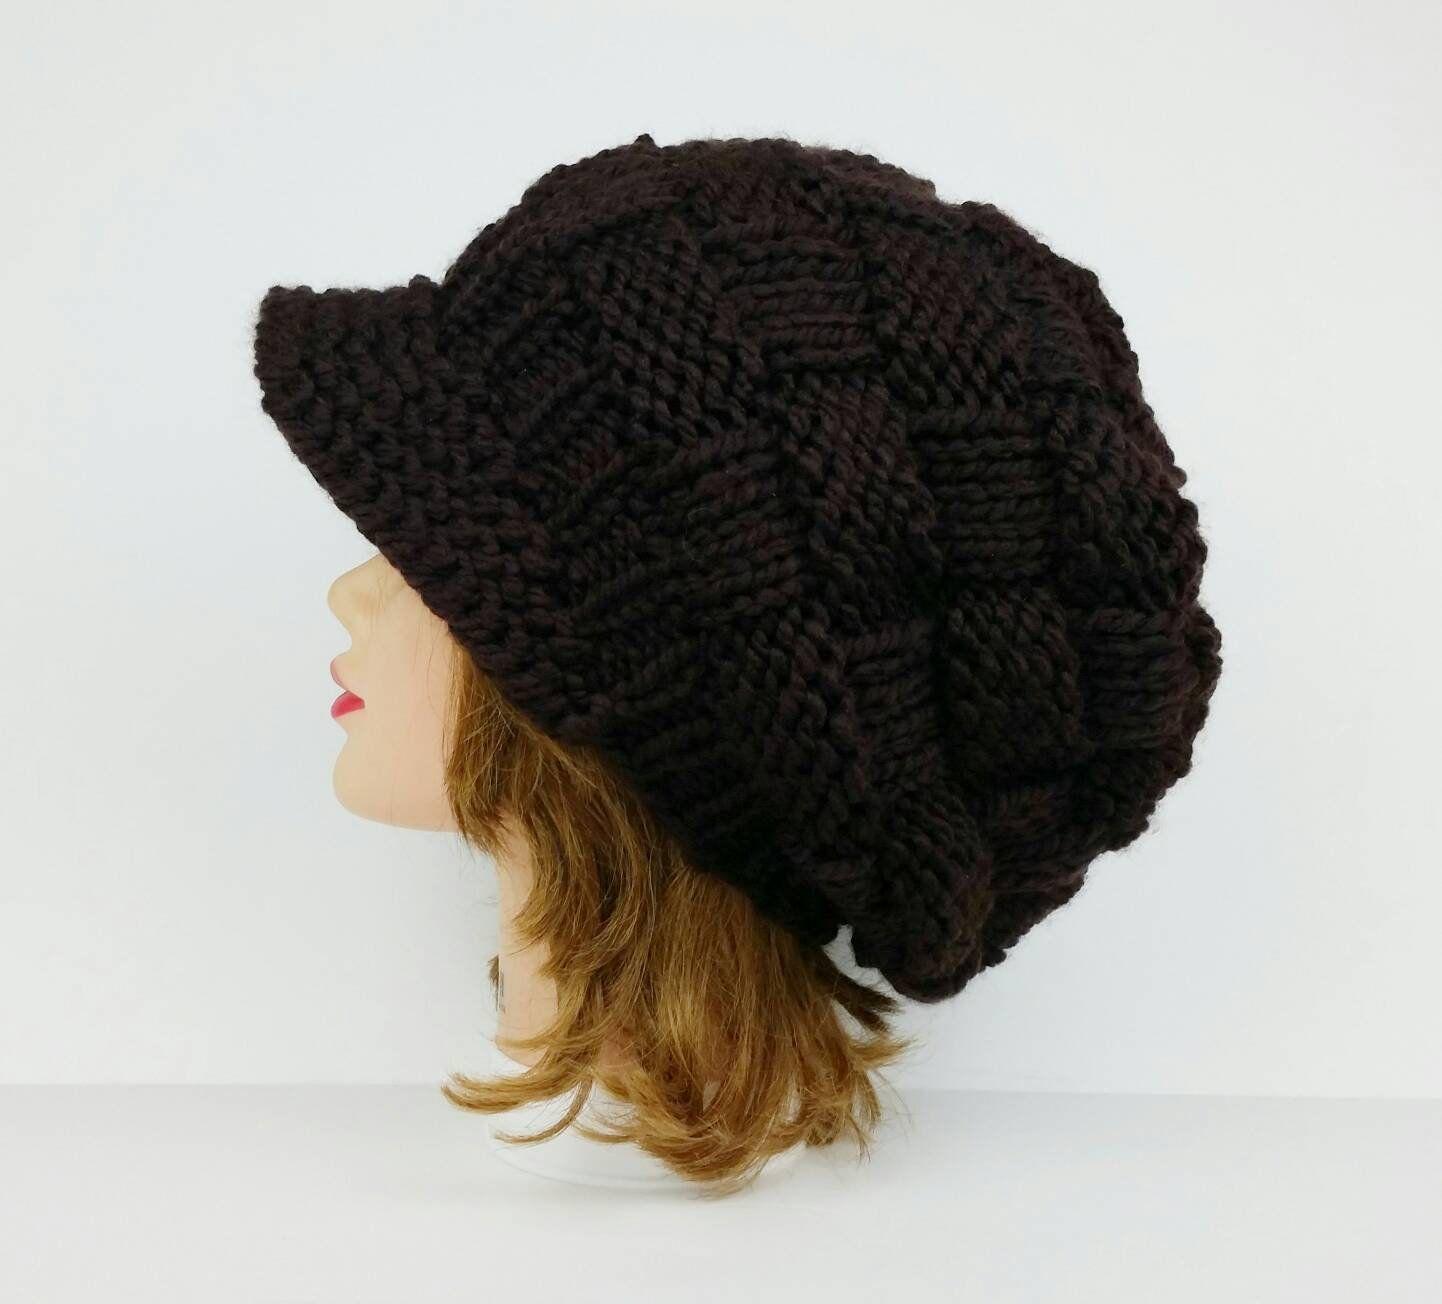 Brown Newsboy Hat Visor Beanie Chunky Knit Hat Women Visor Hat Winter Hats For Women Slouchy Hat With Bri Chunky Knit Hat Crochet Newsboy Hat Knitted Hats